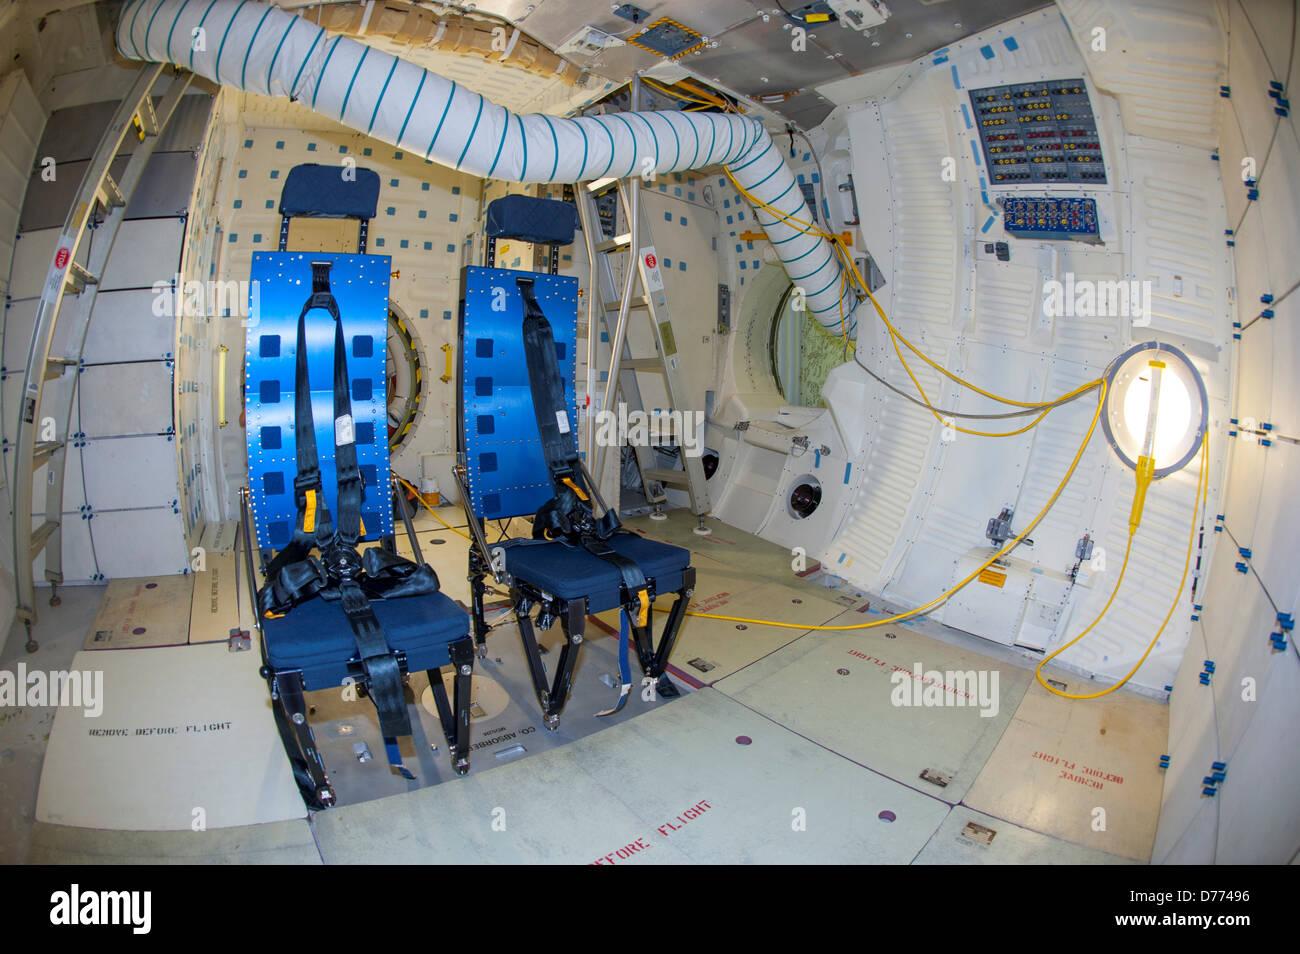 space shuttle seats - photo #14